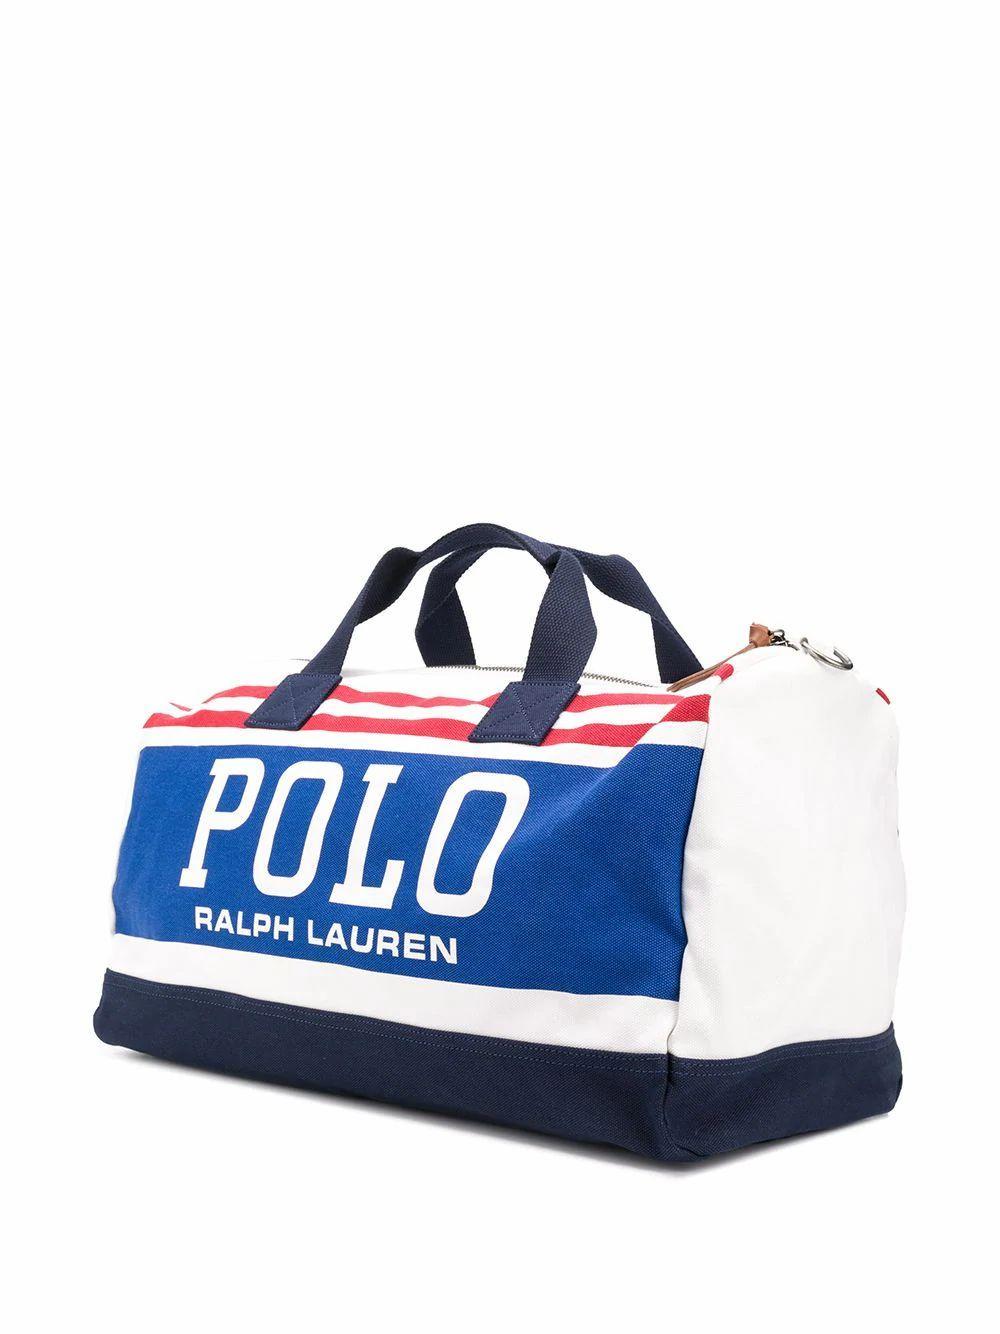 RALPH LAUREN MEN'S 405777376001 WHITE COTTON TRAVEL BAG